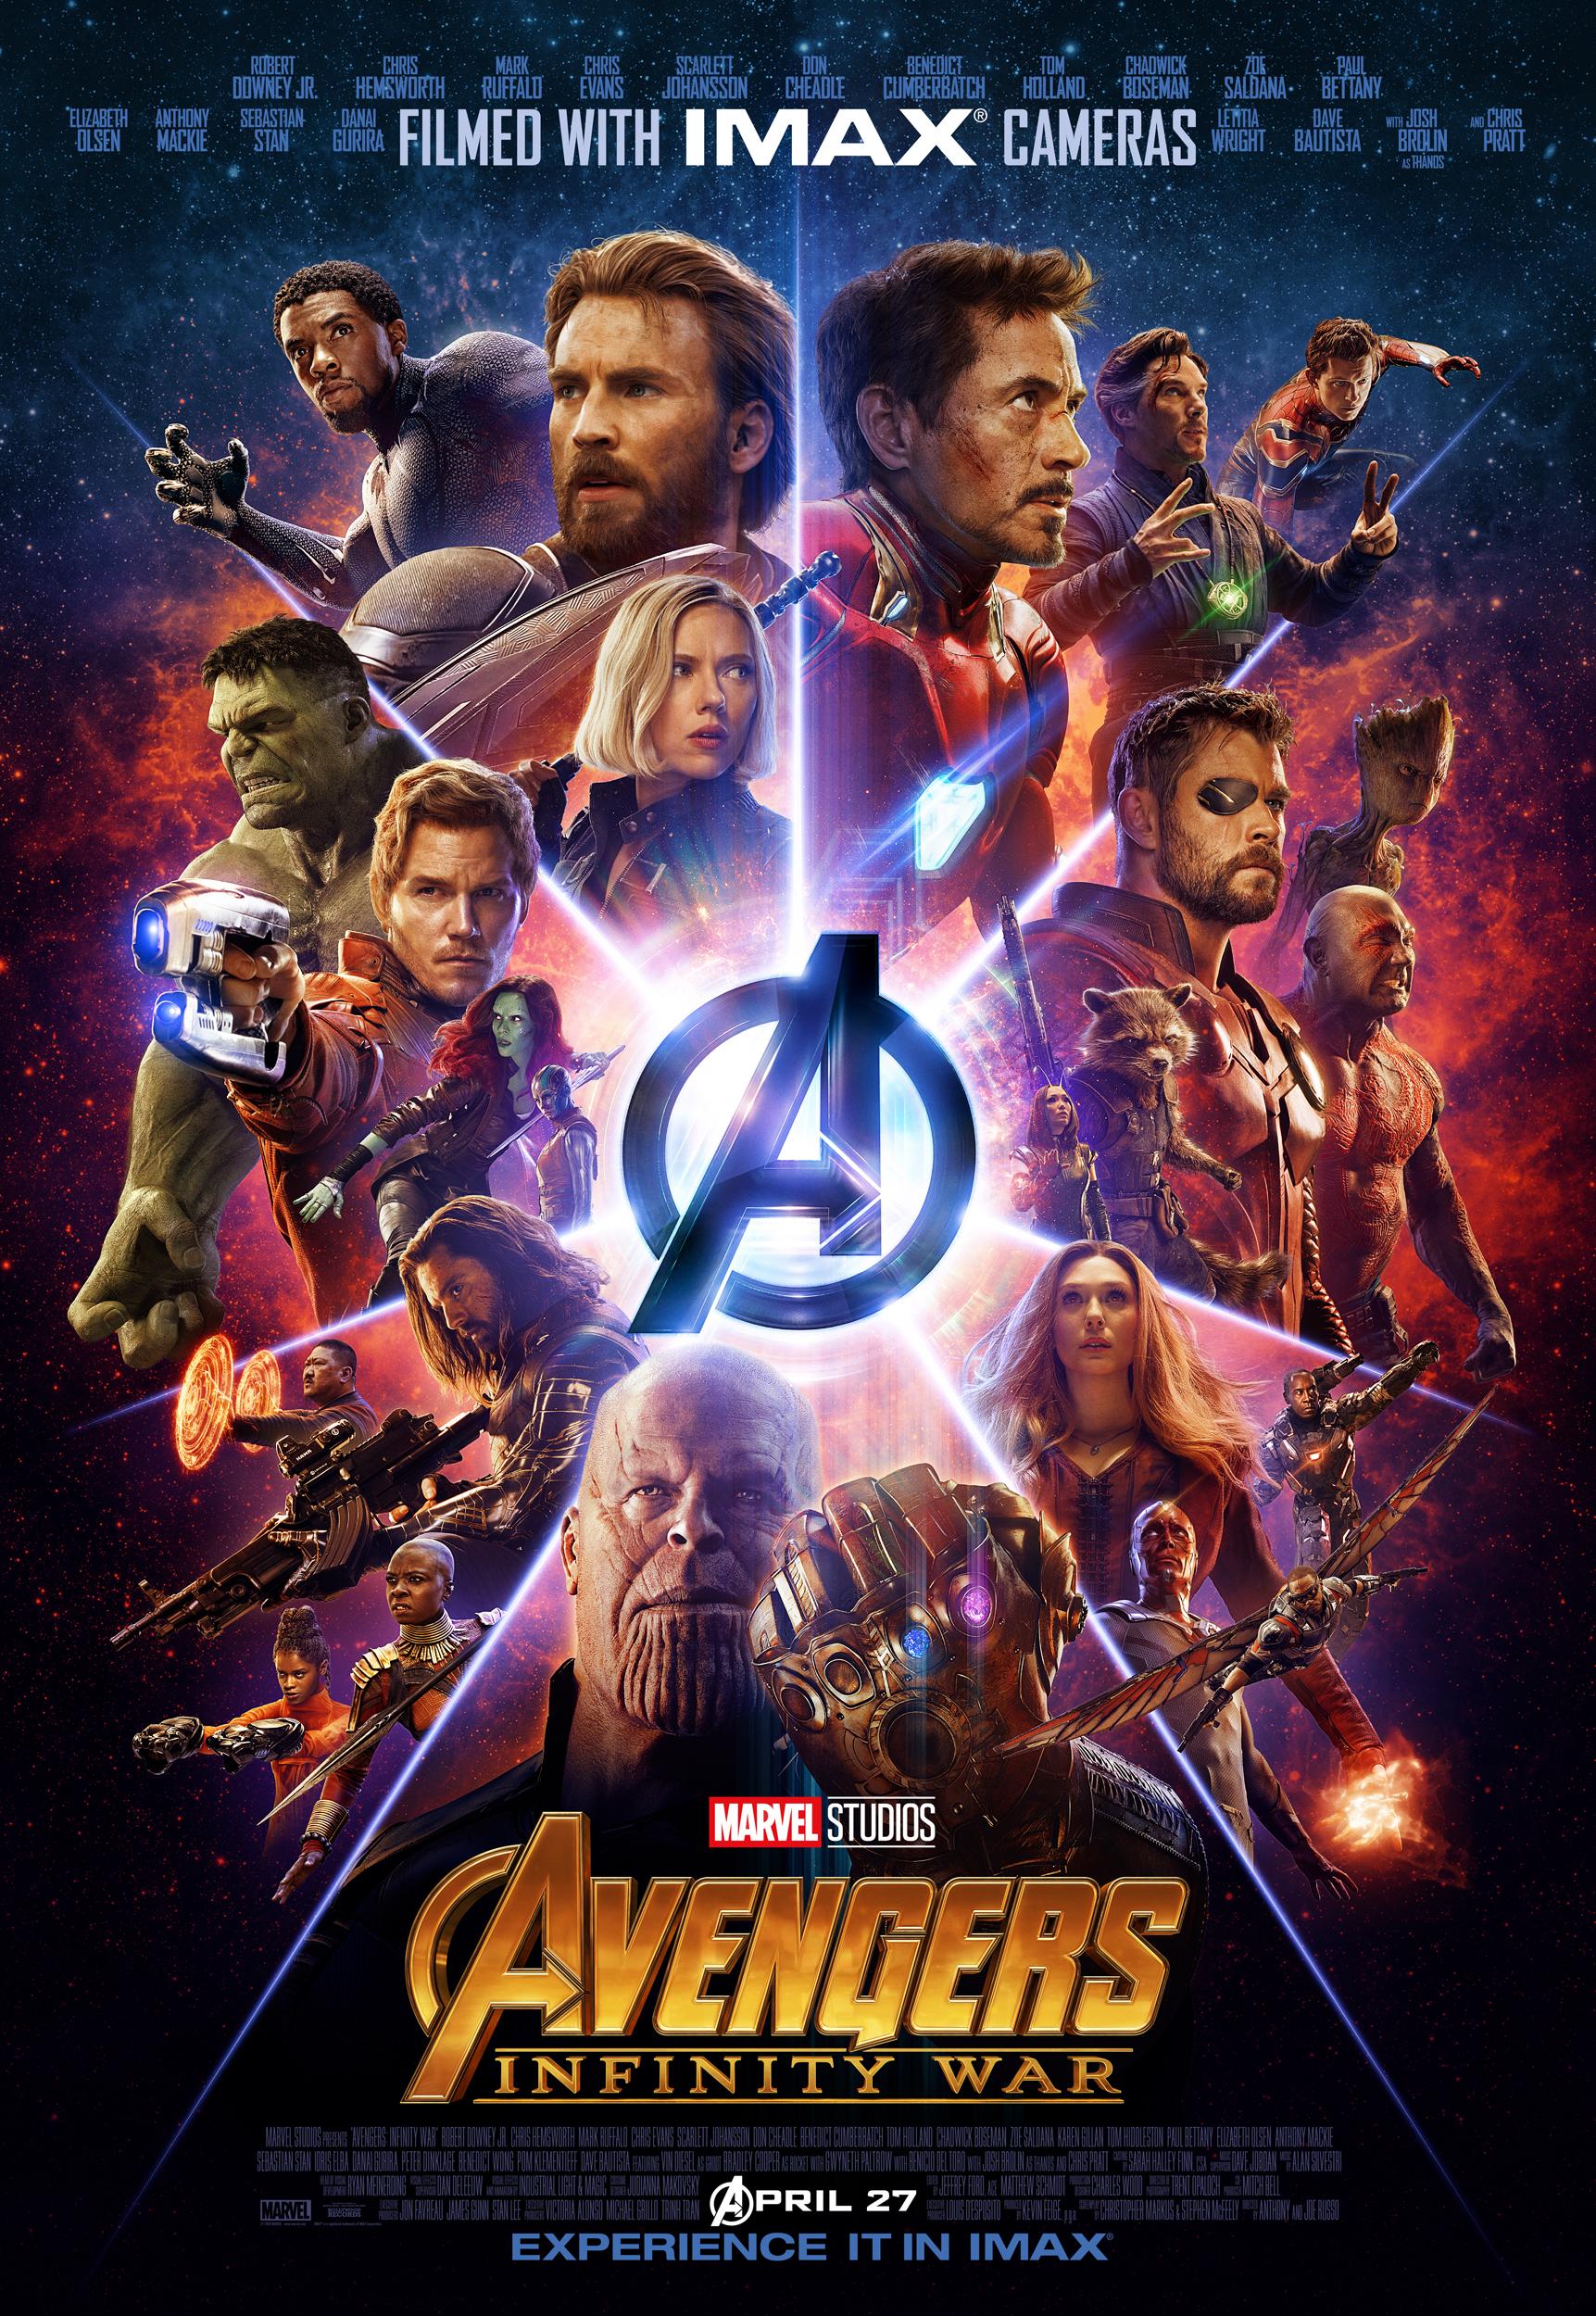 avengers_infinity_war_imax_poster